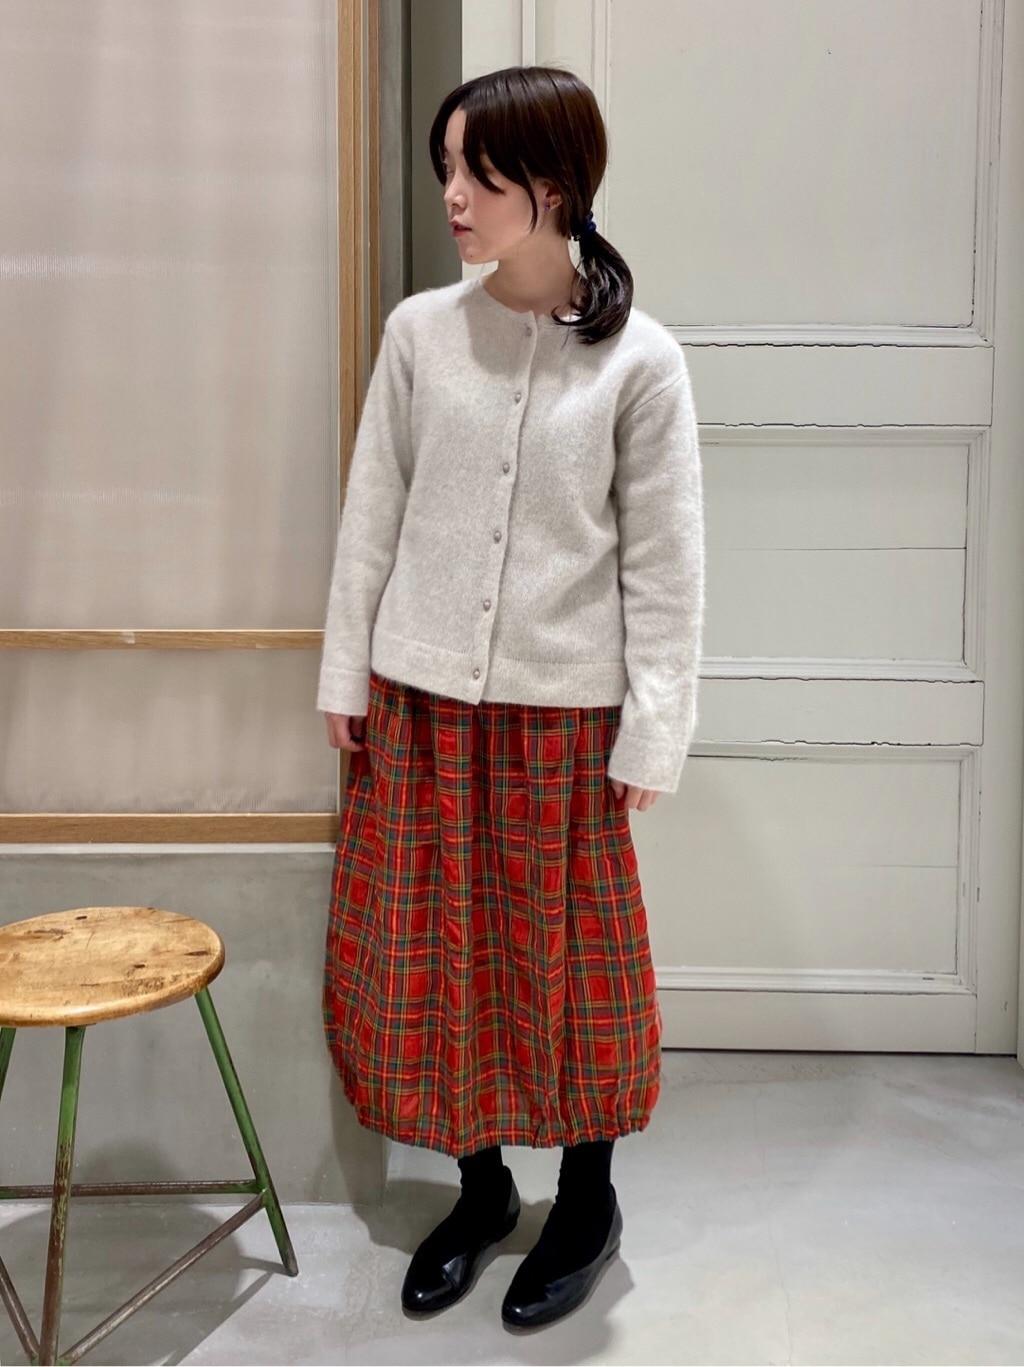 bulle de savon 渋谷スクランブルスクエア 身長:153cm 2020.12.04